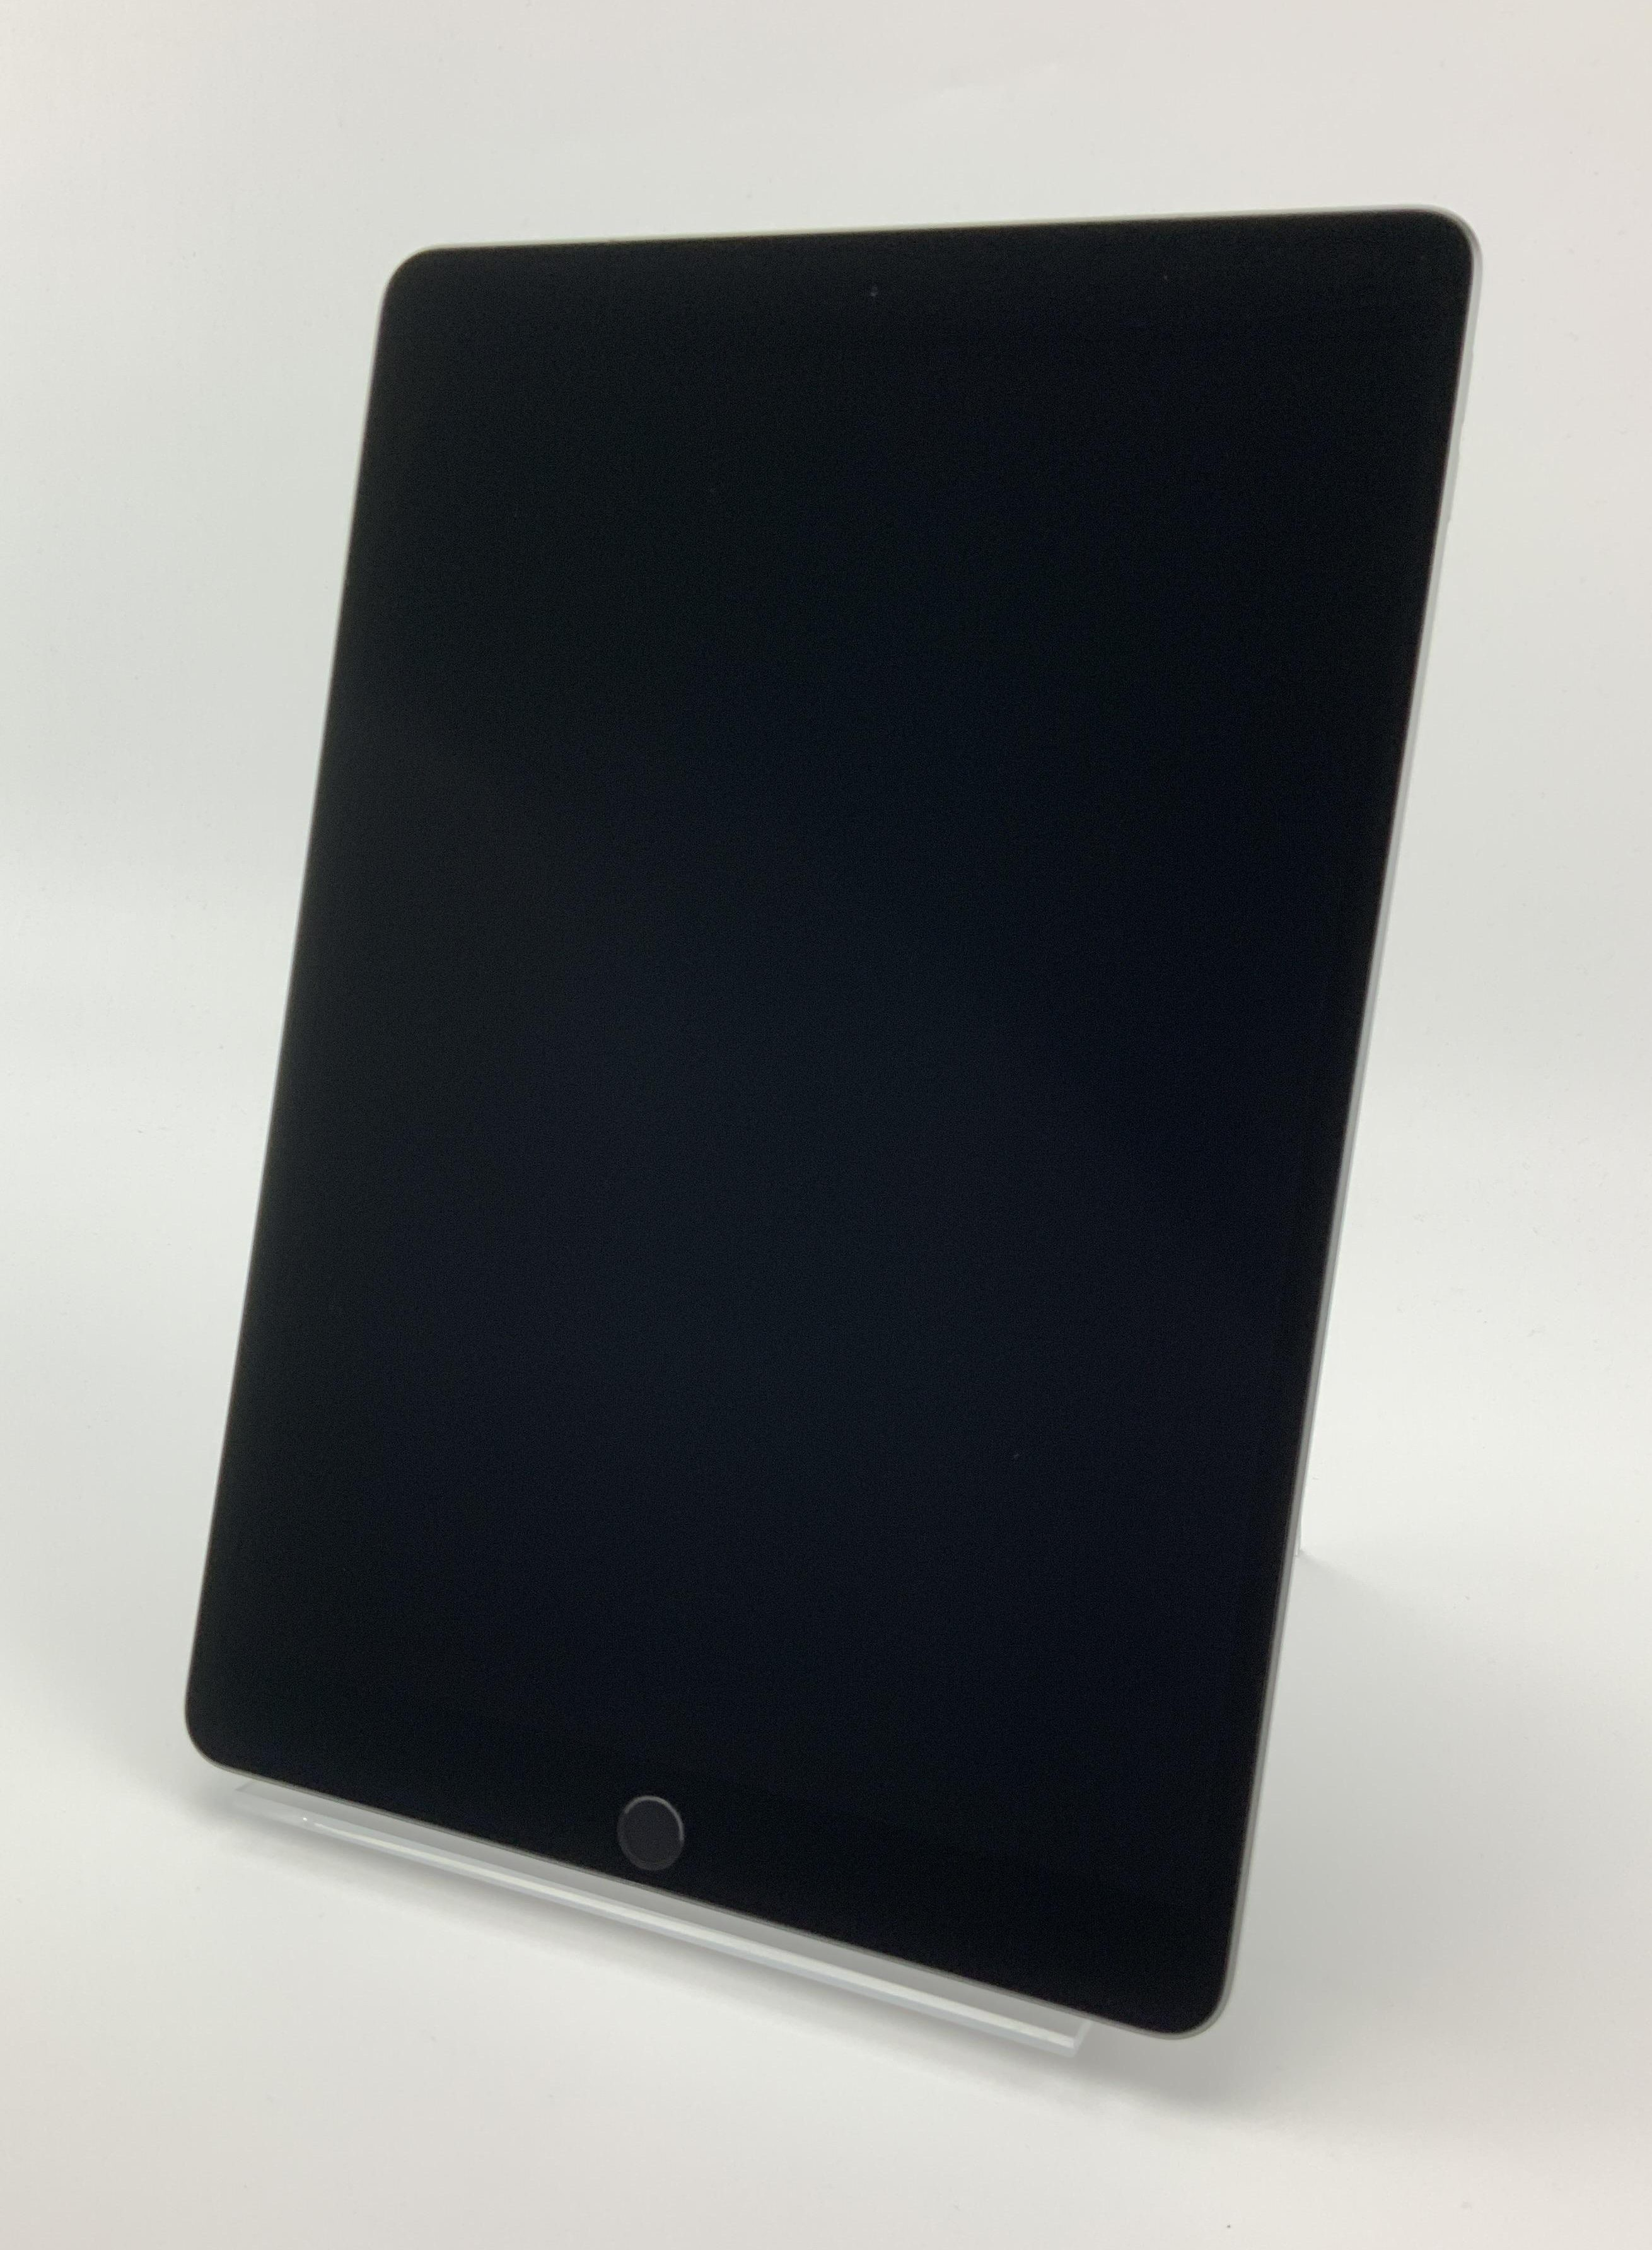 iPad Air 3 Wi-Fi + Cellular 64GB, 64GB, Space Gray, image 1